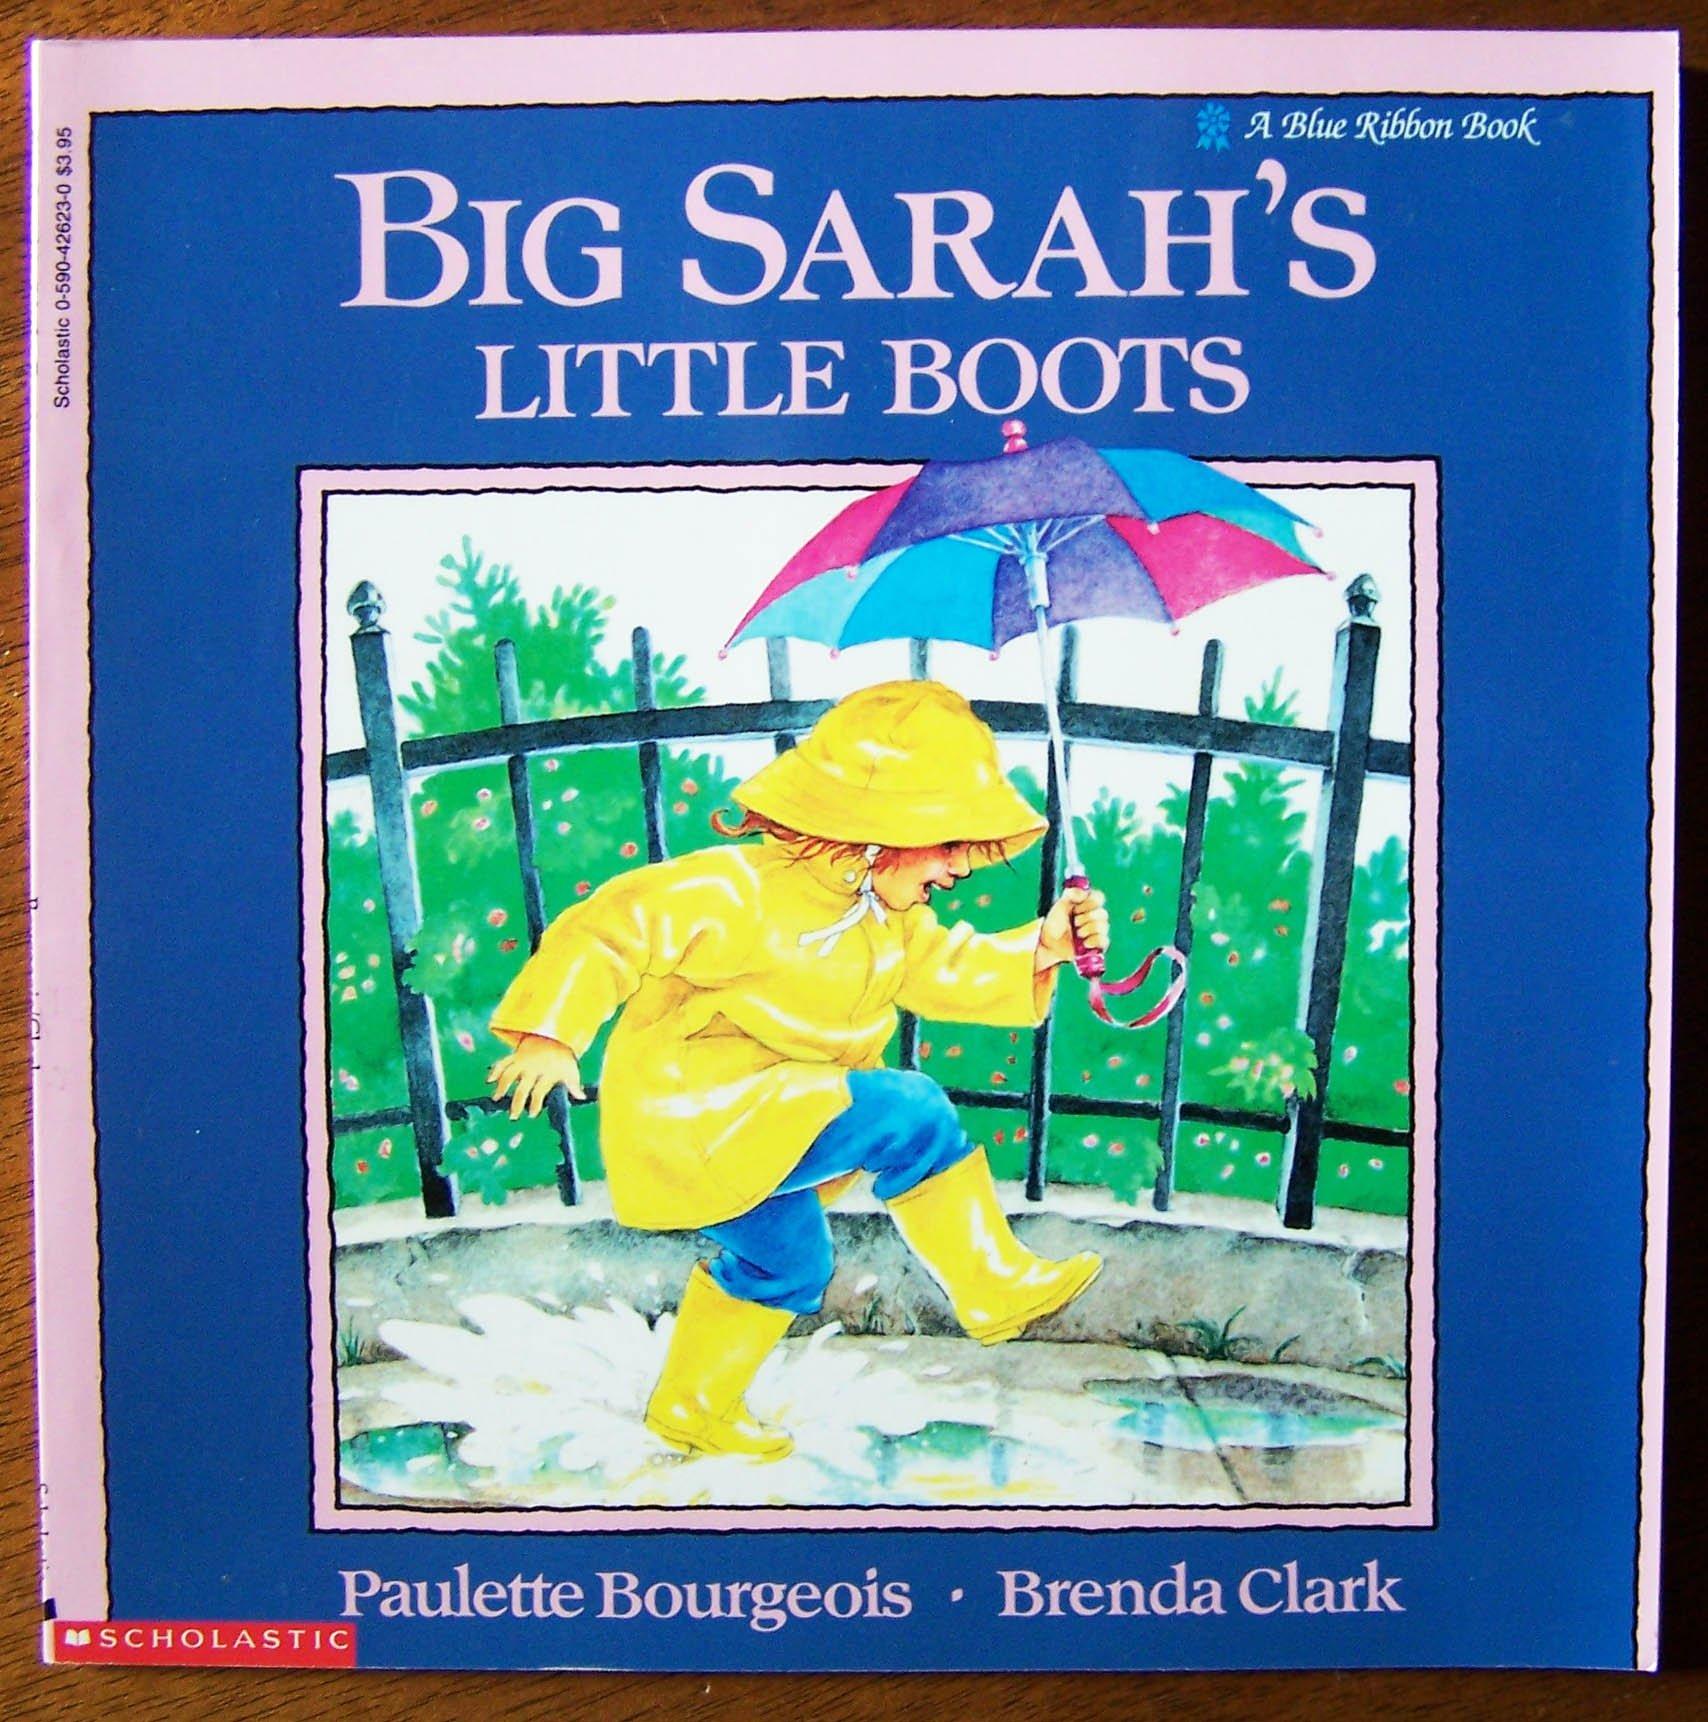 Big Sarah's Little Boots (a Blue Ribbon Book): Paulette Bourgeois, Brenda  Clark: 9780590426237: Amazon: Books